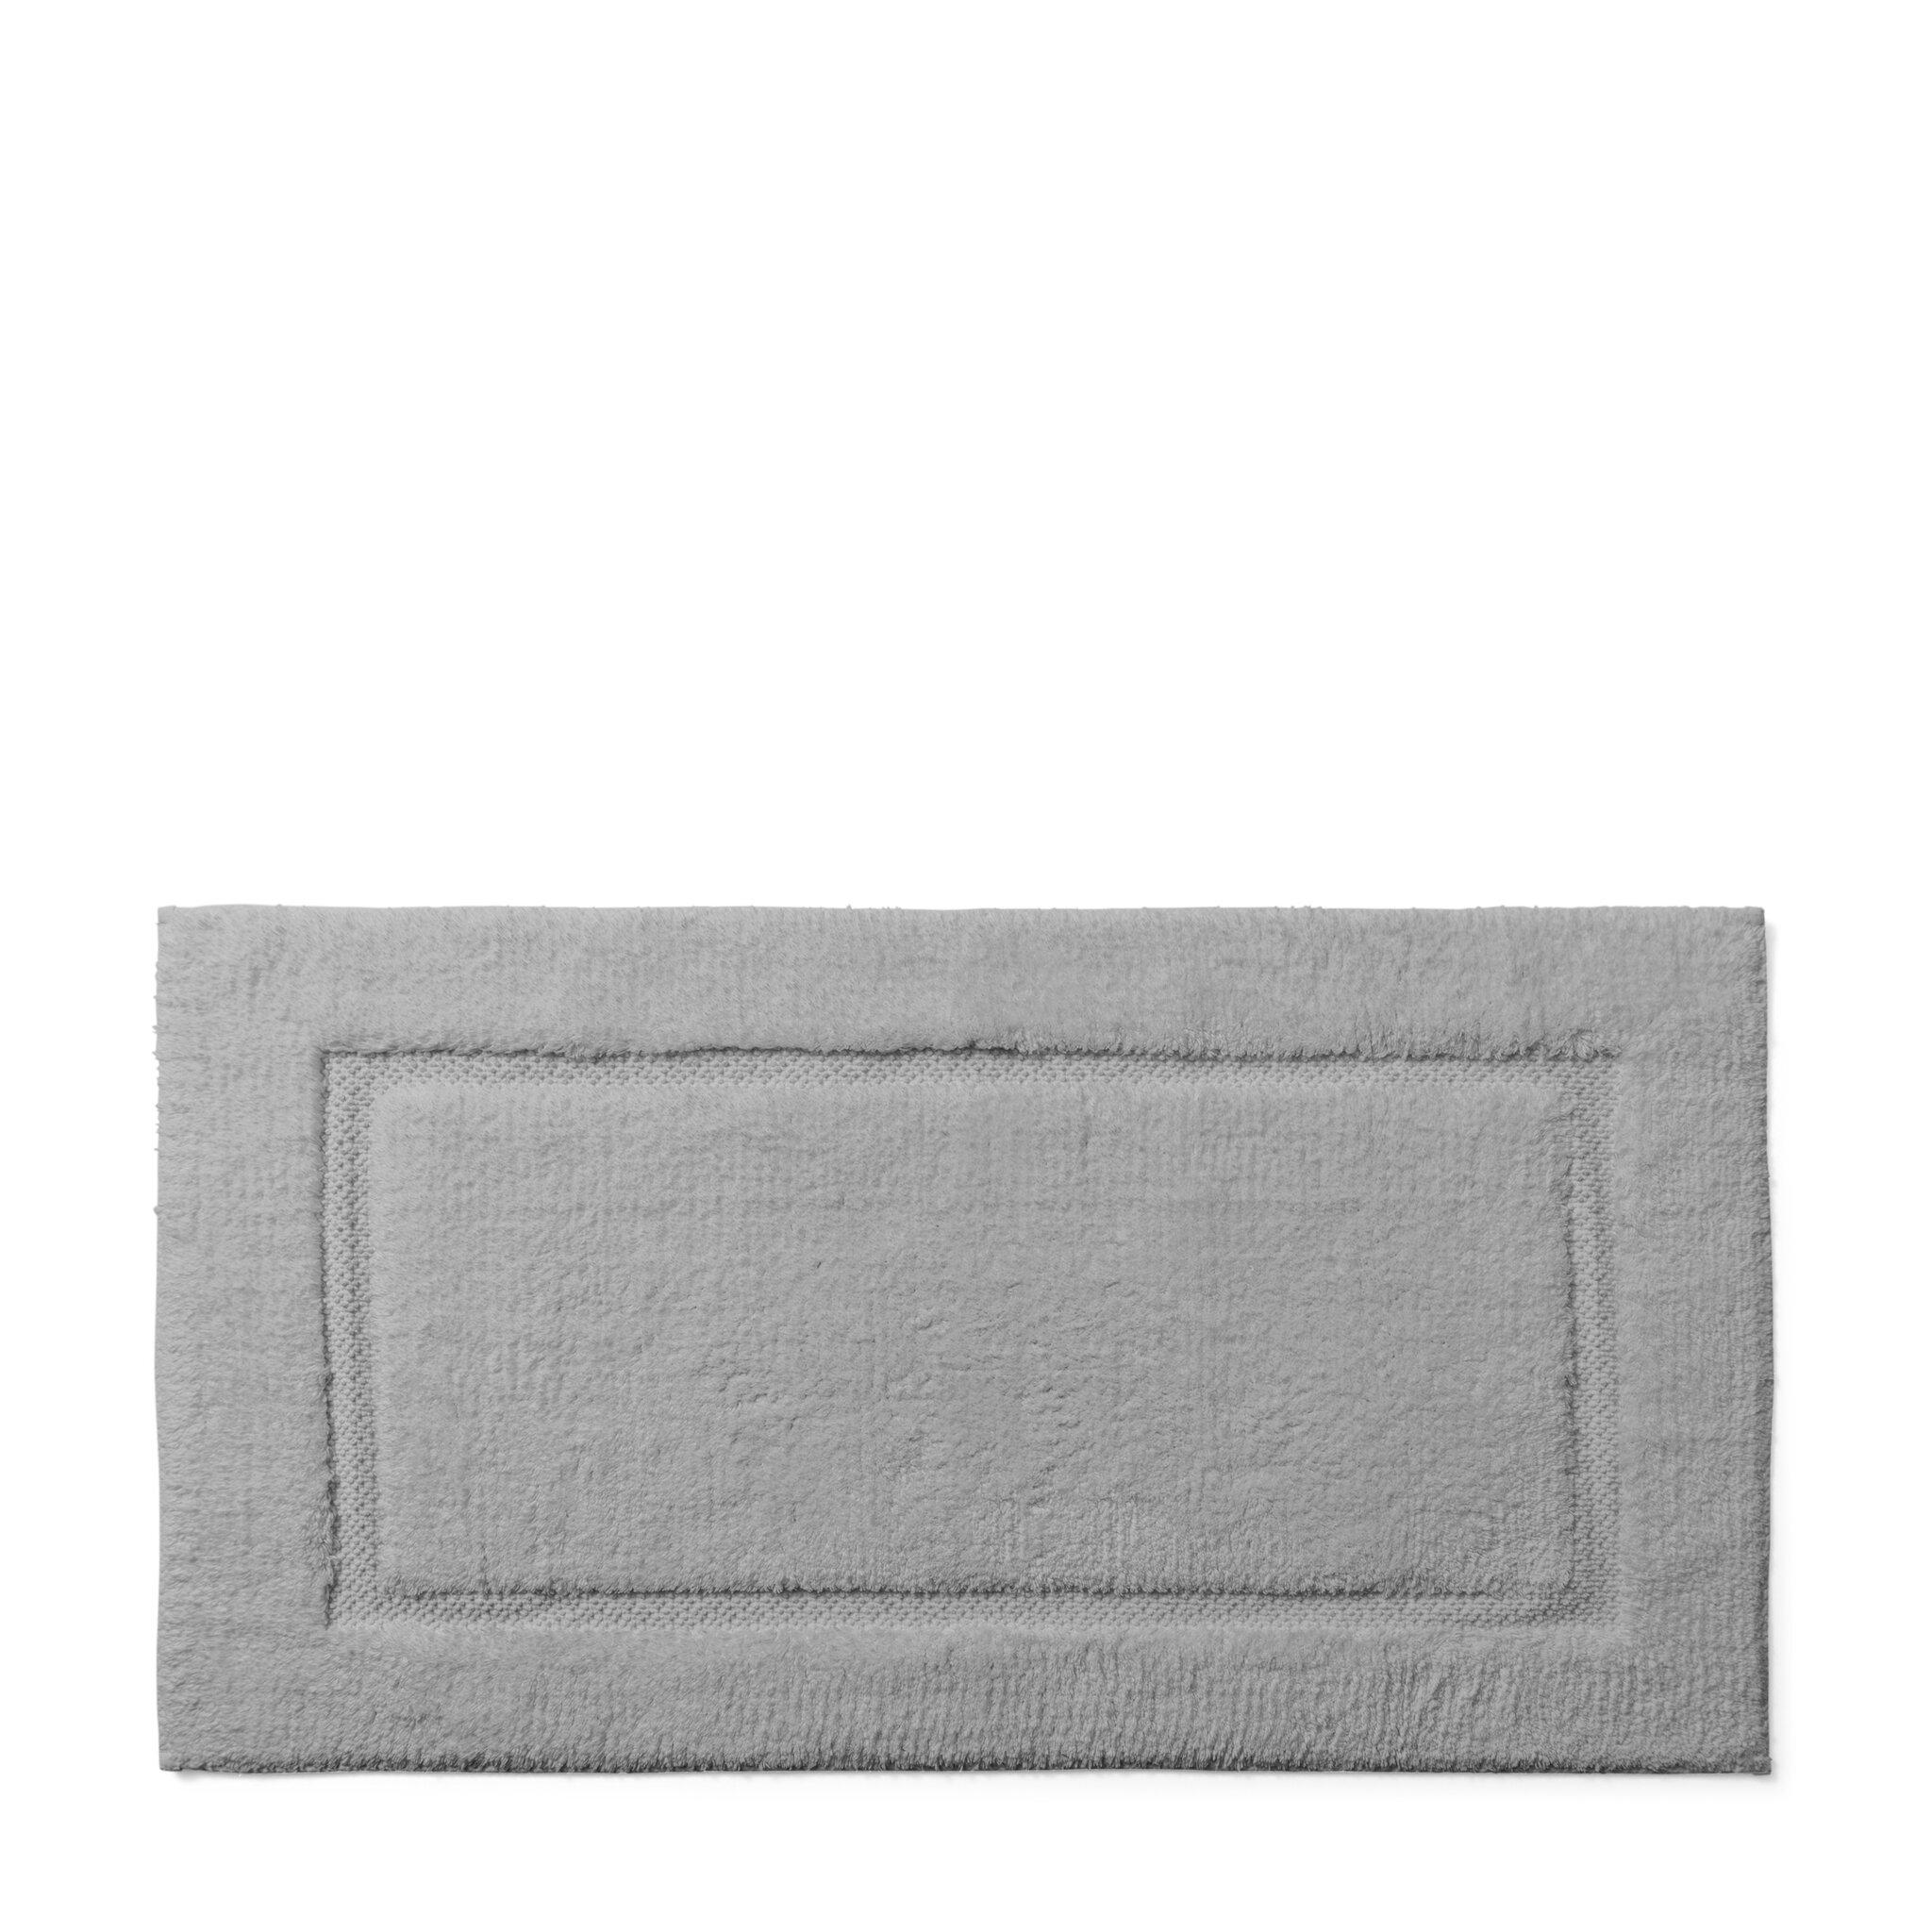 Badrumsmatta. 70x120 cm - Badrumsmattor - Köp online på åhlens.se! 0723fc93fa91f